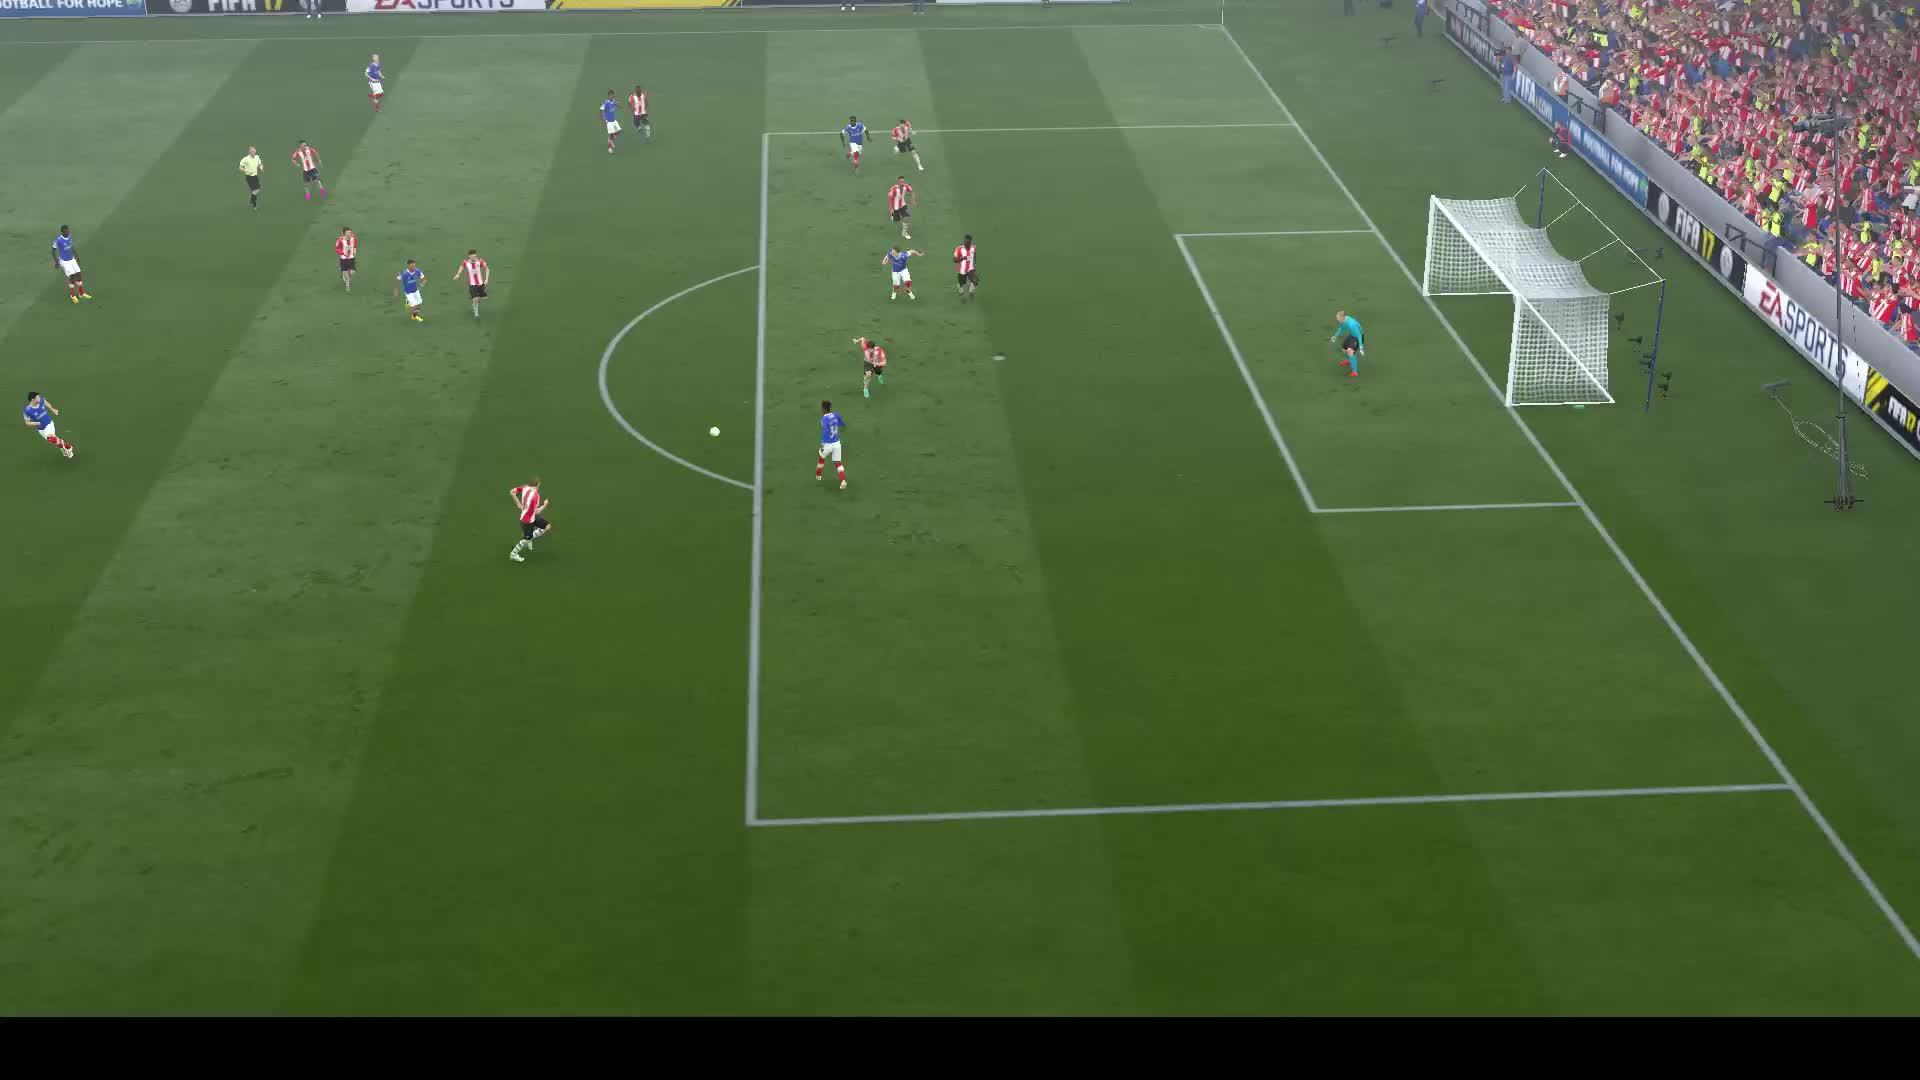 fifa17, fifacareers, glitch, FIFA 17 Glitch GIFs